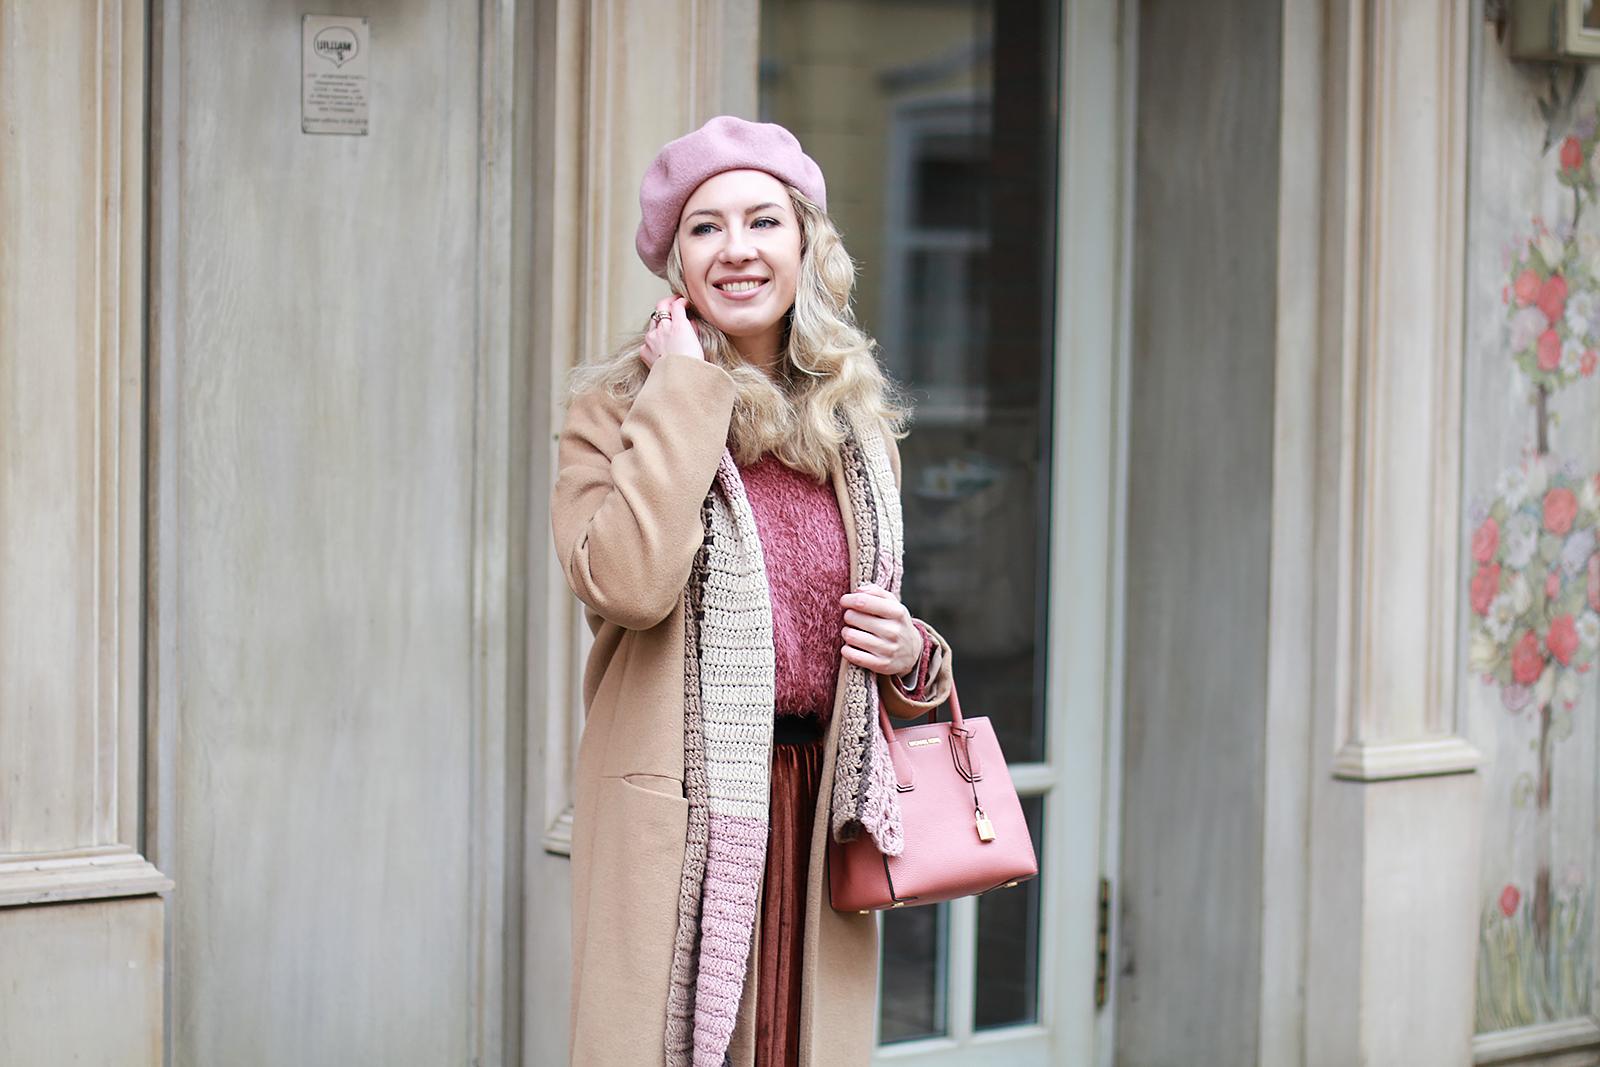 Margarita_Maslova_Ritalifestyle_Fashion_blogger_Moscow_Romantic_style_sport_chic_Pastel_looks_midi_skirt_look